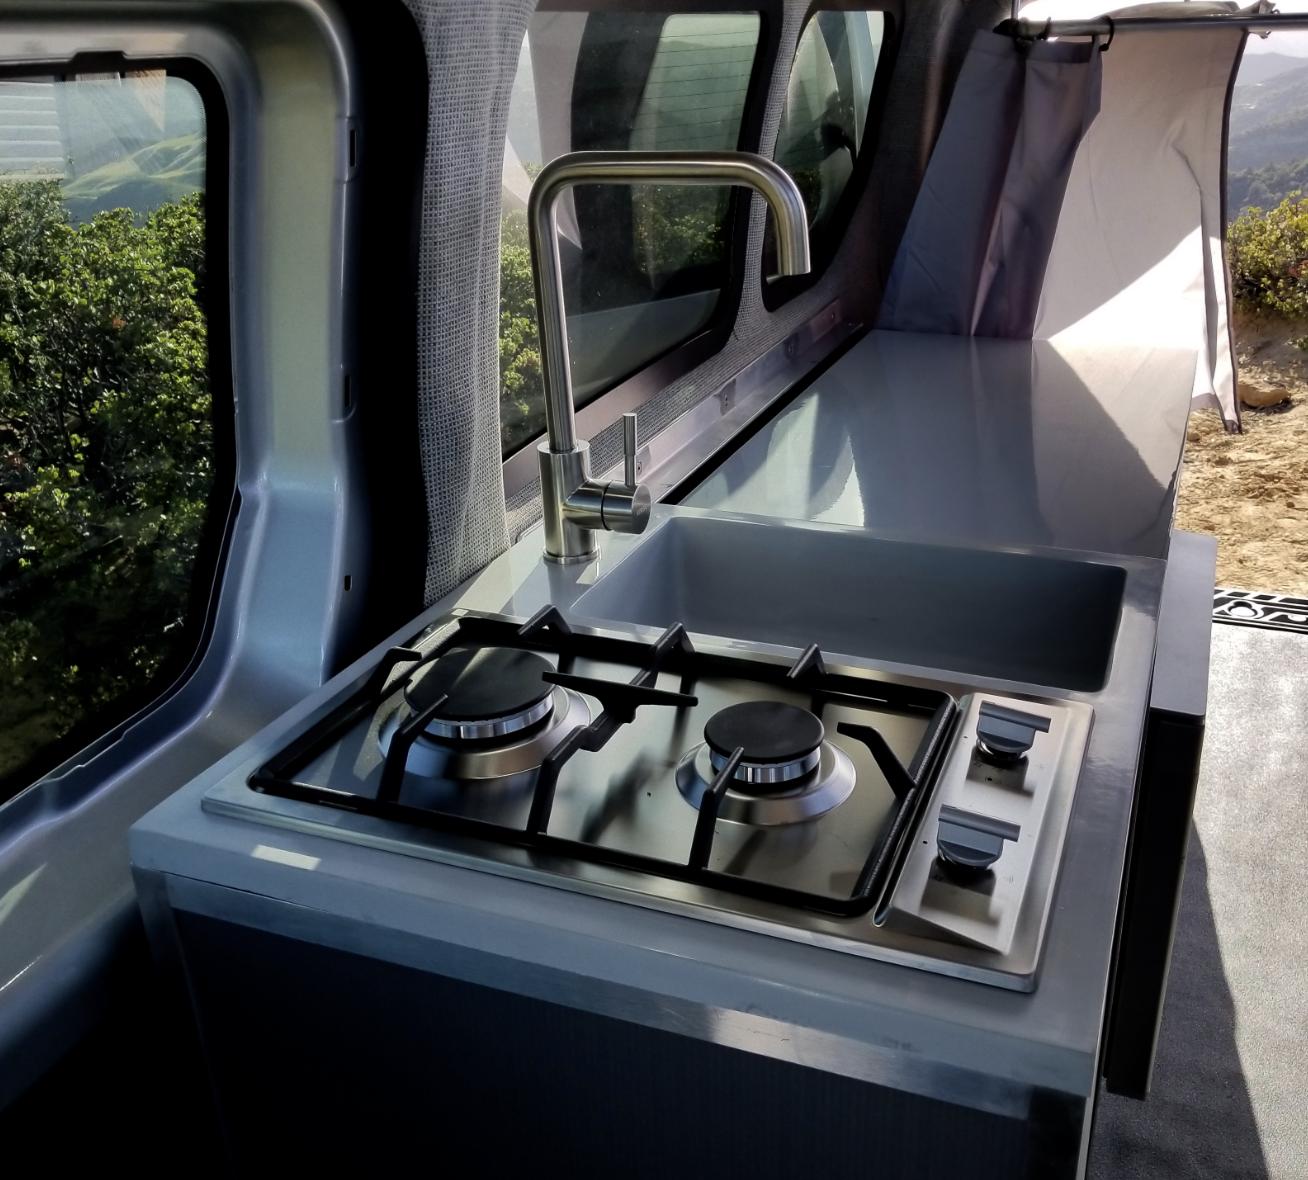 Storage under sink, underside fridge, plenty of counter space, water/25 gal. Ford Transit Custom 2020